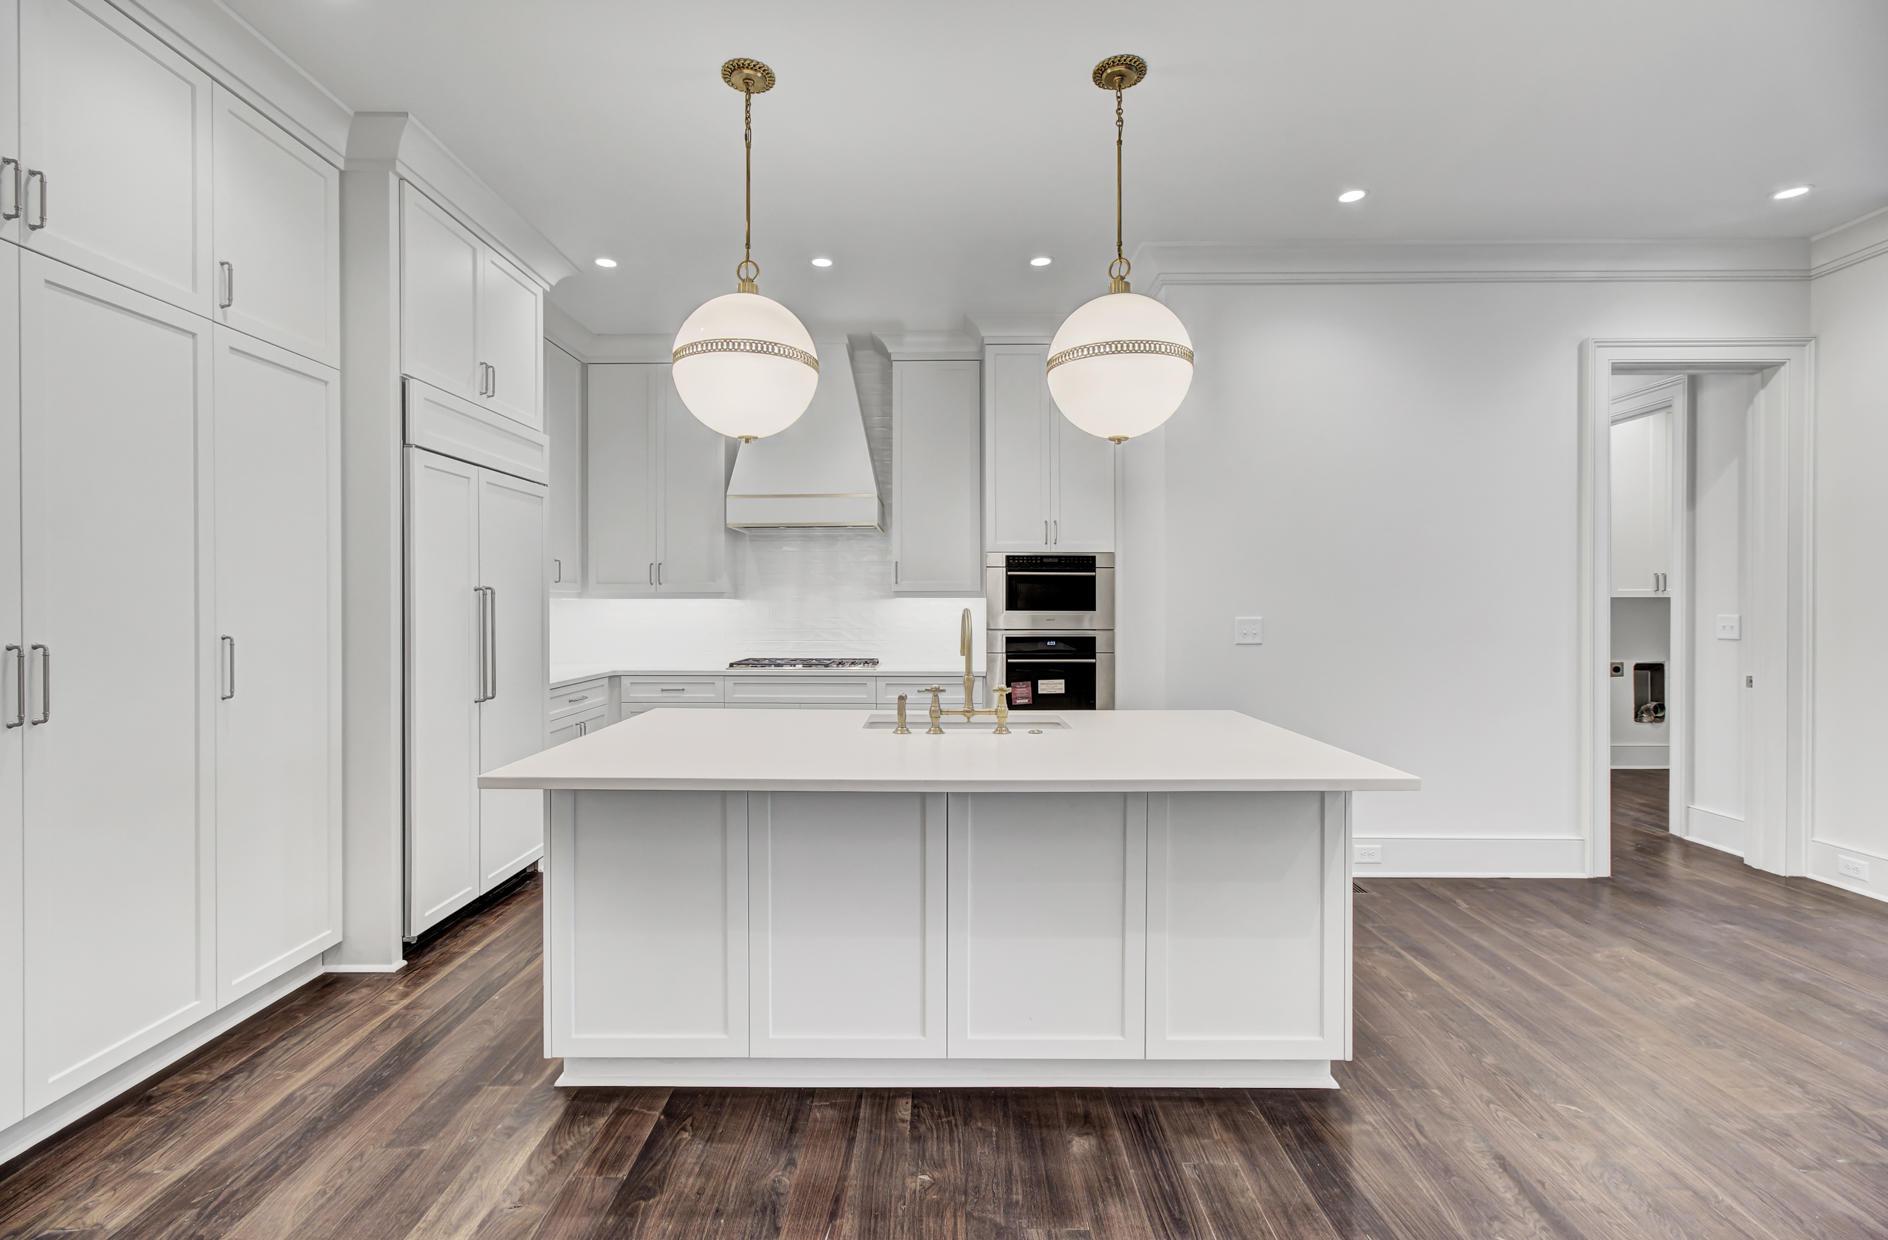 Harleston Village Homes For Sale - 31 Smith, Charleston, SC - 51